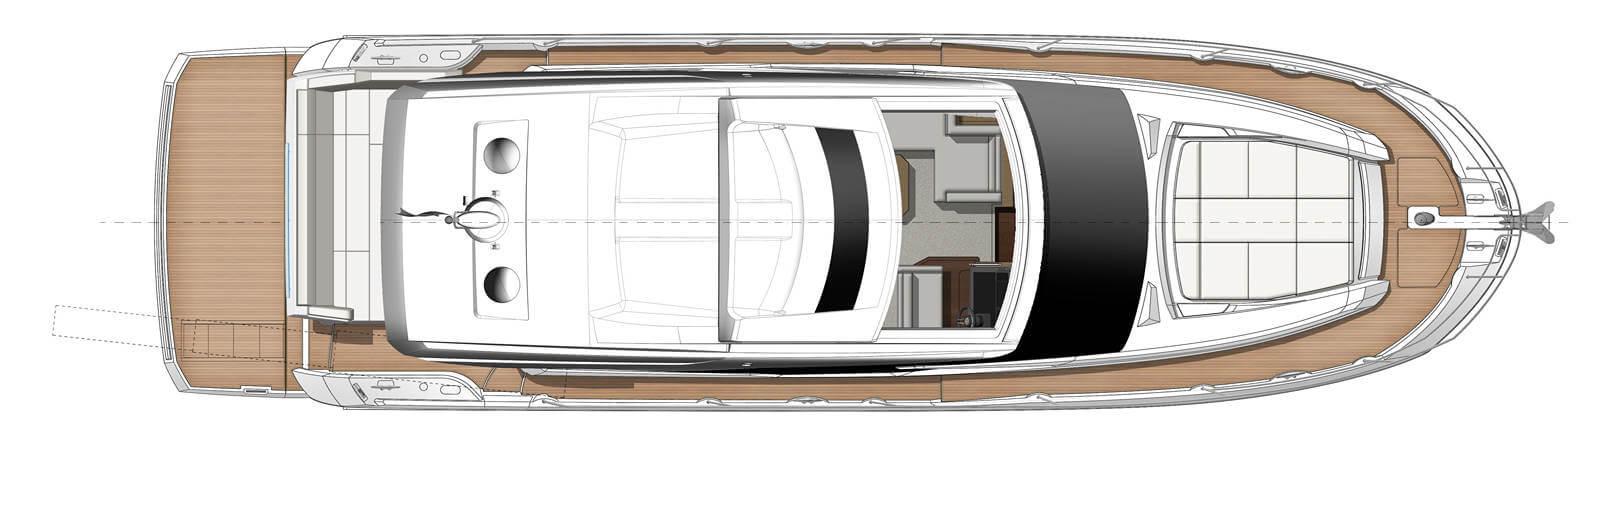 SPORT-LINE PRESTIGE 520S - Stream Yachts